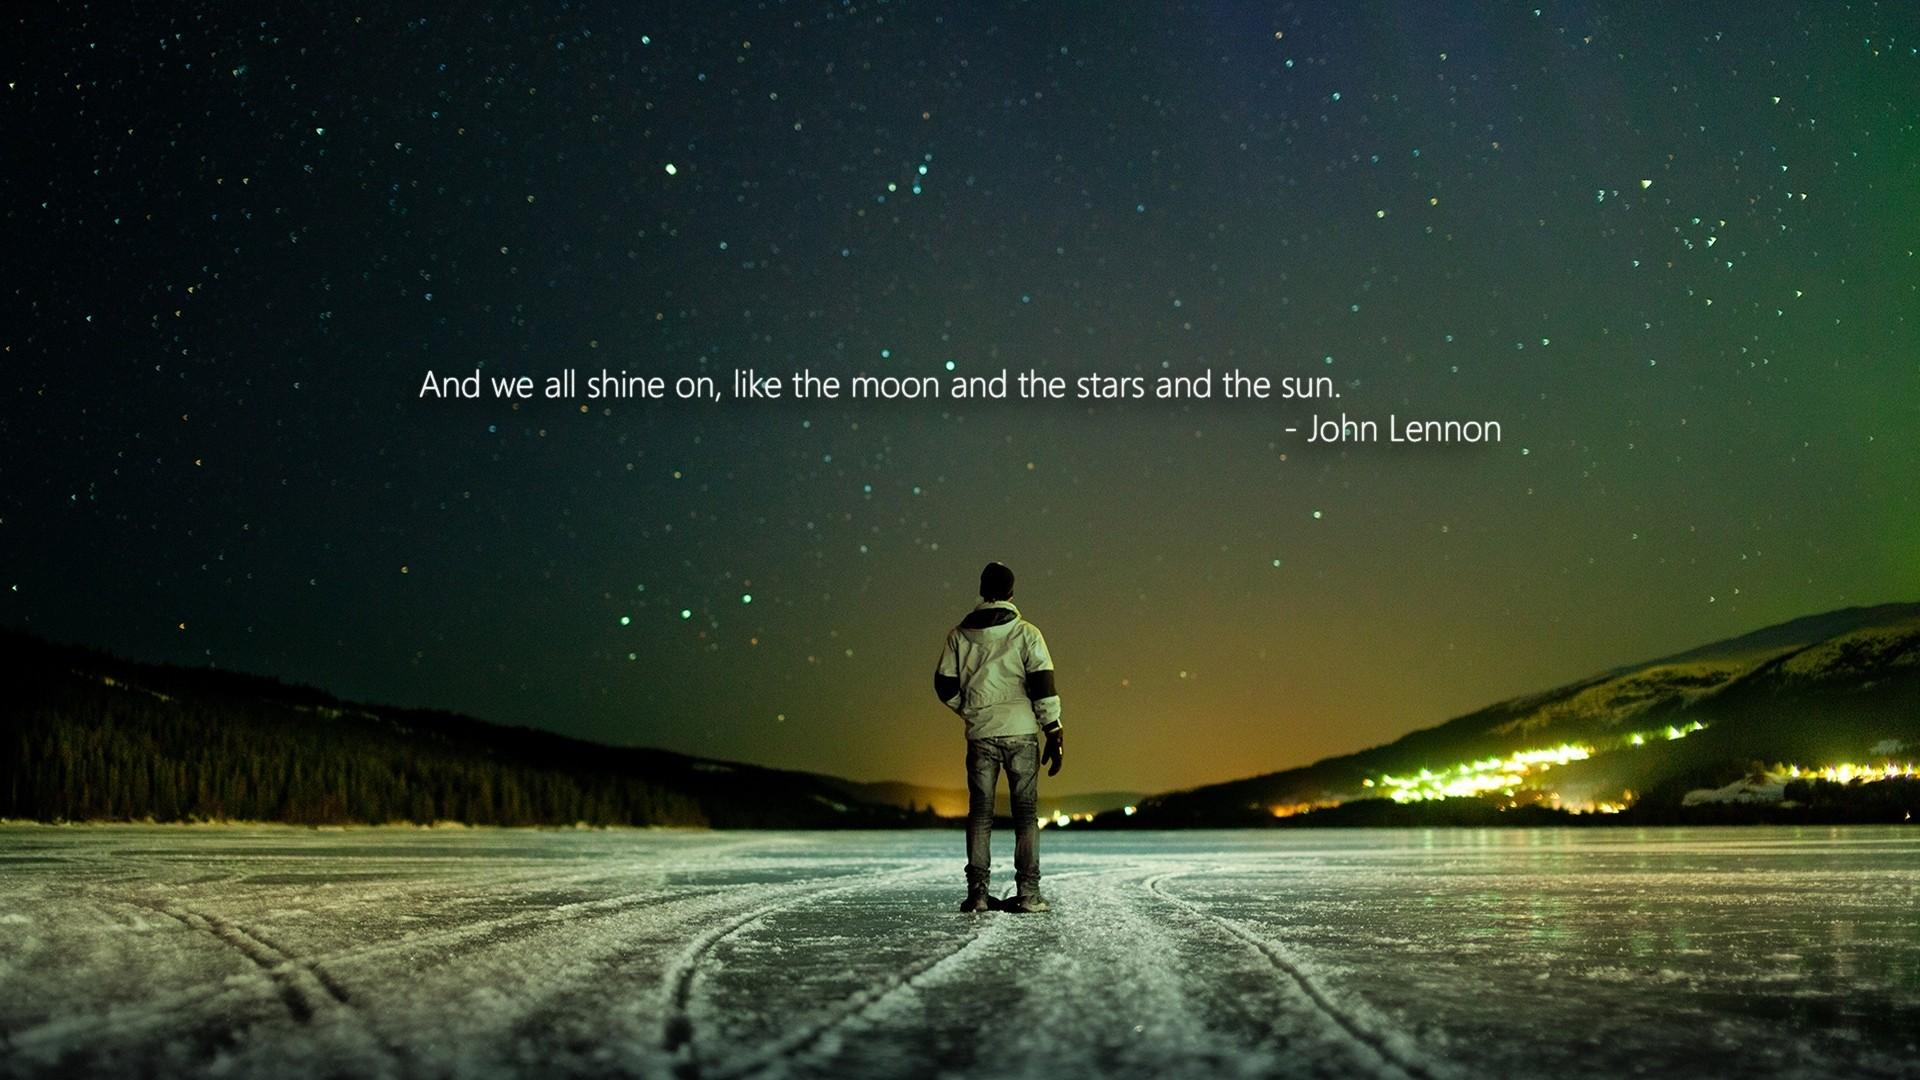 Inspirational Wallpaper Image